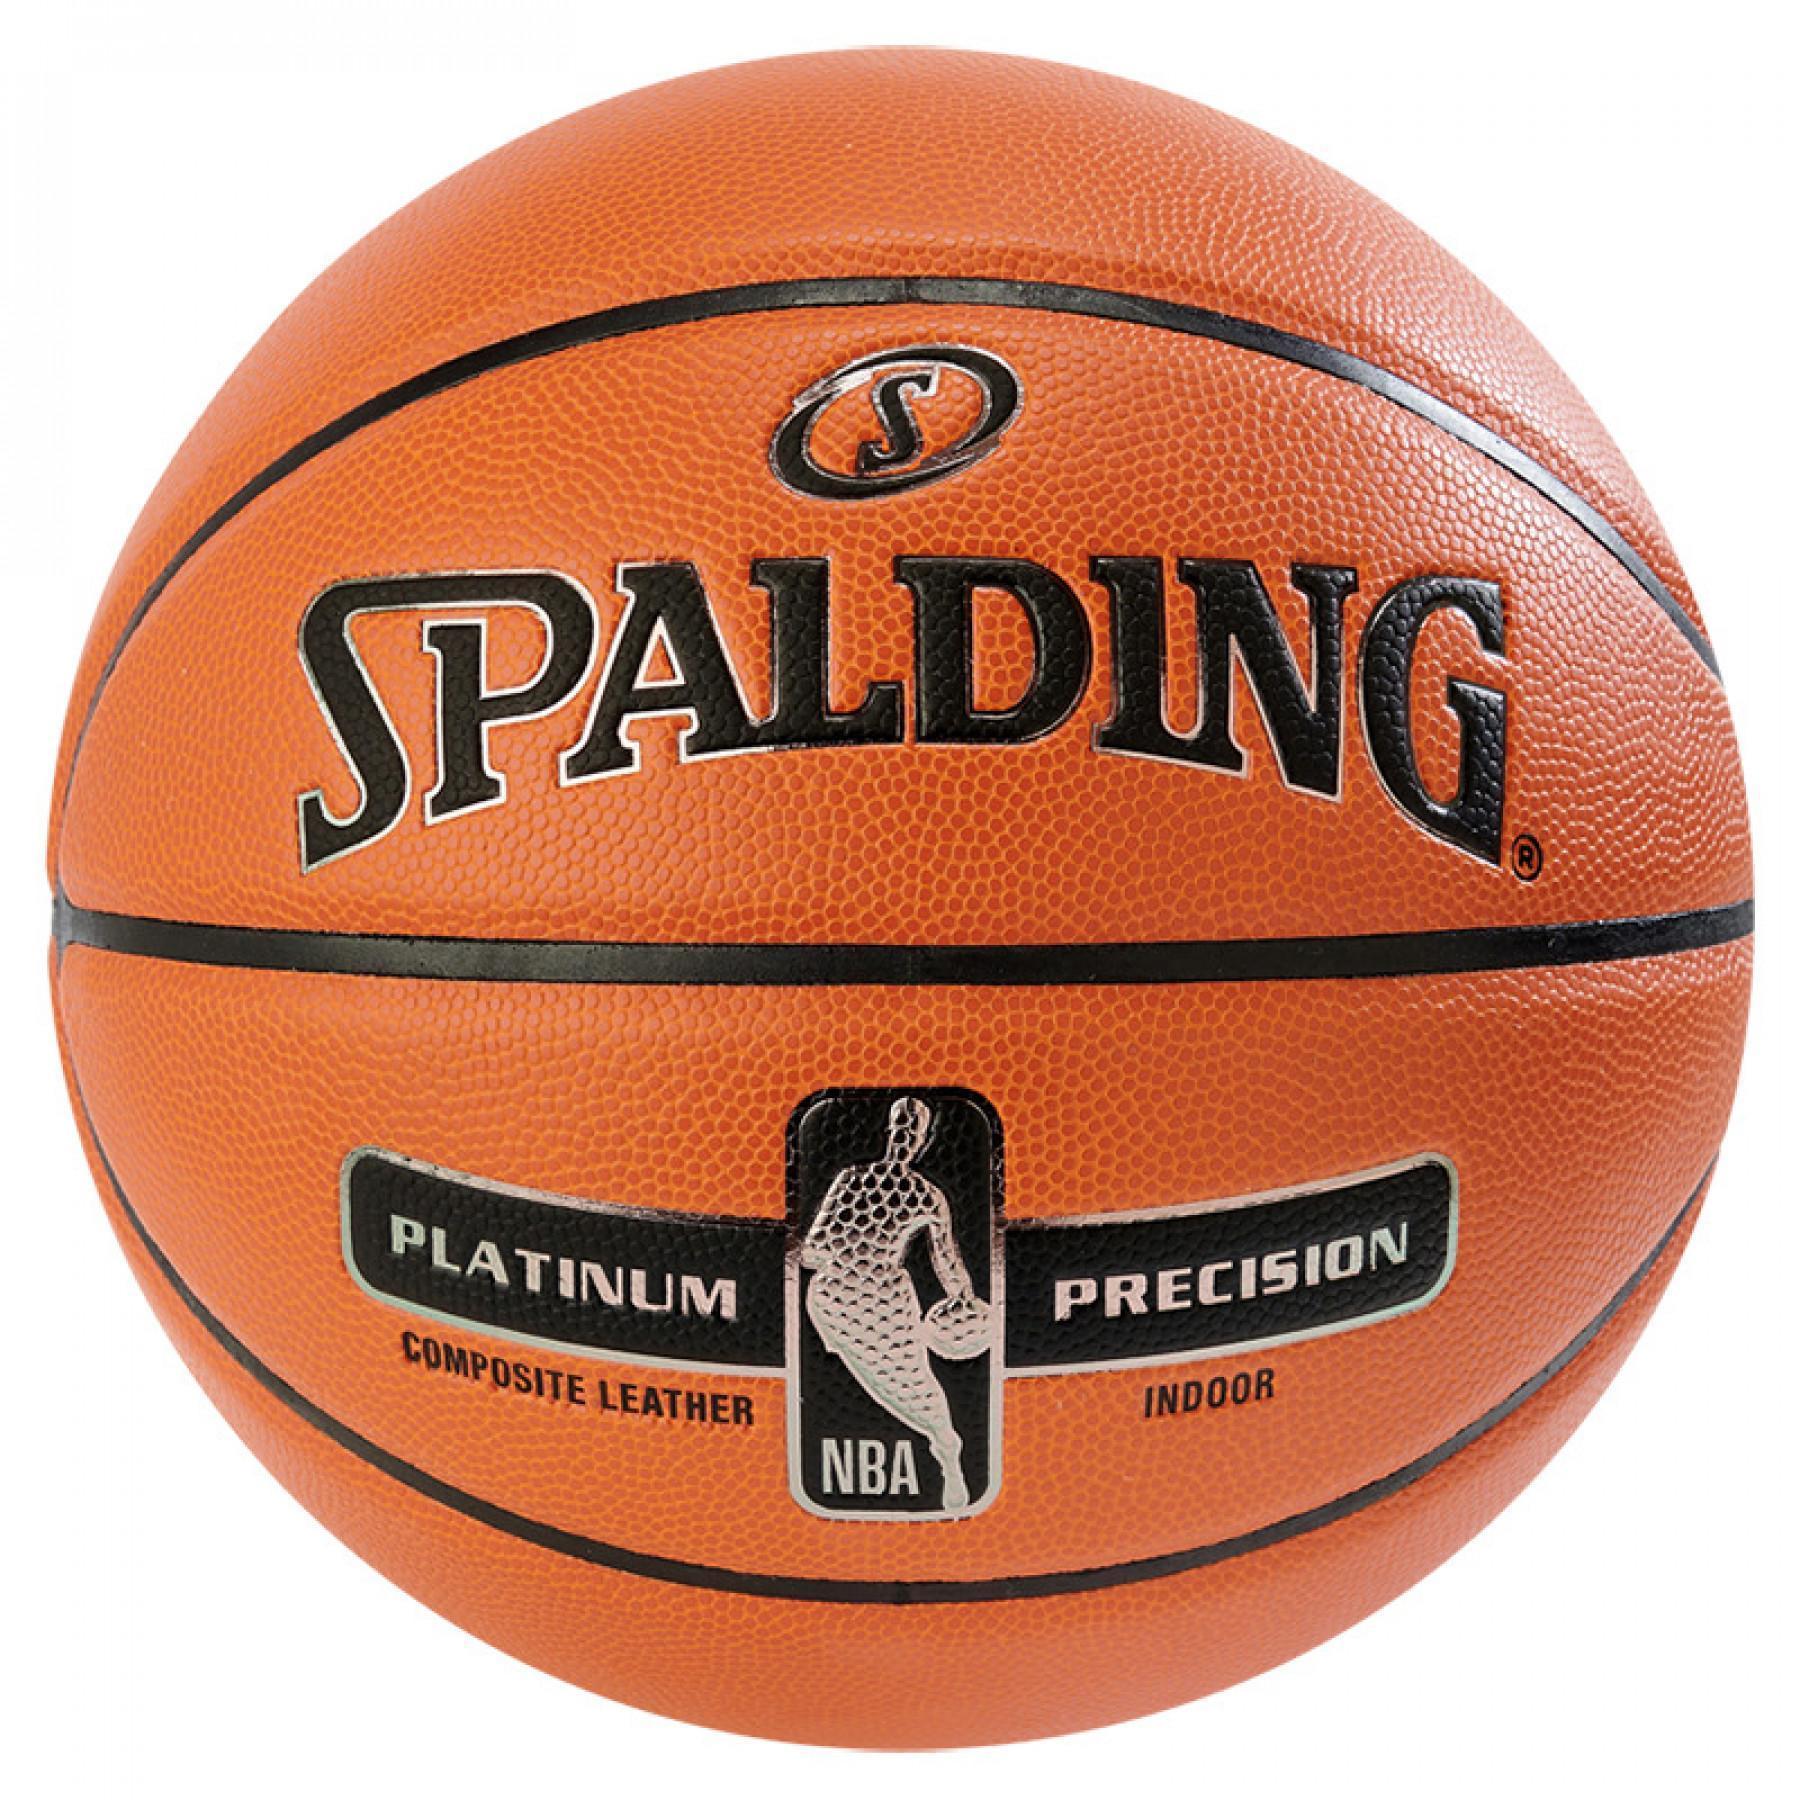 Spalding Ball NBA Platinum Precision (76-307z)